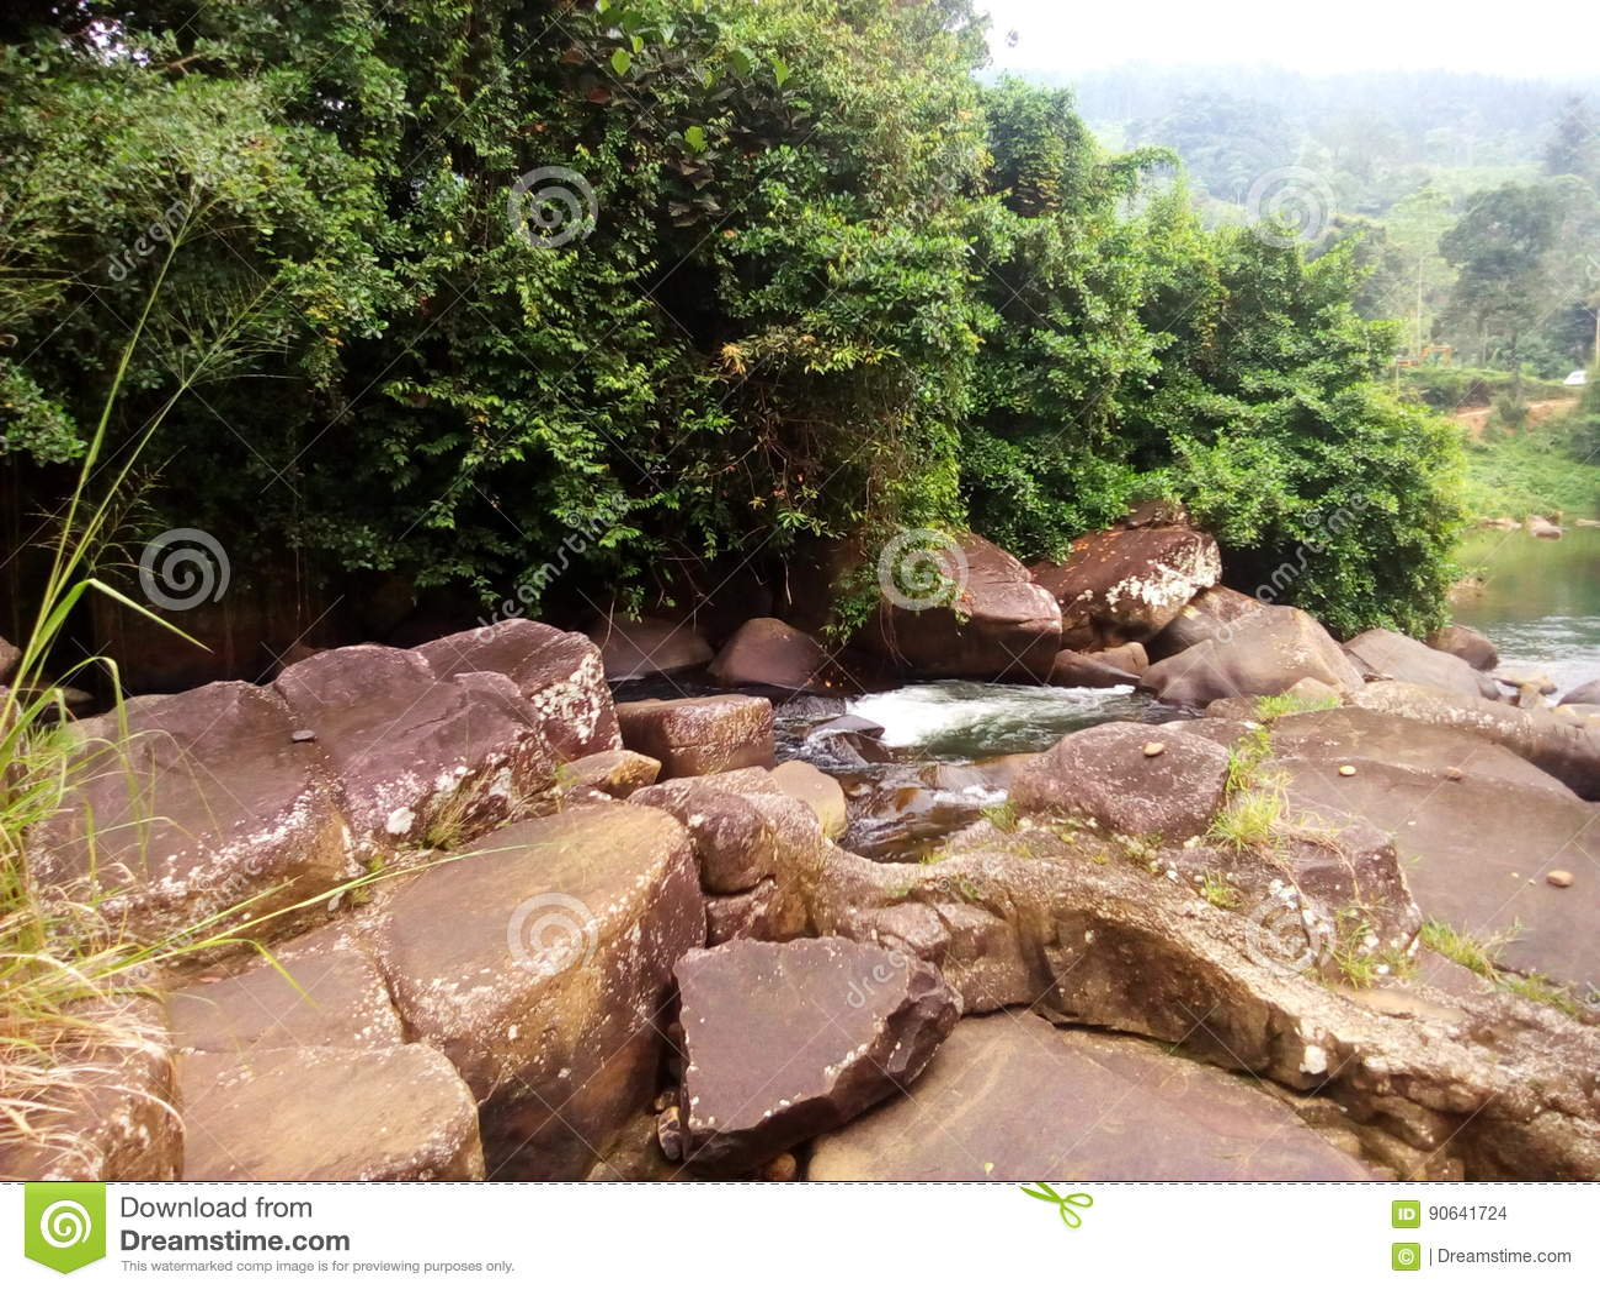 Srilankan rivers